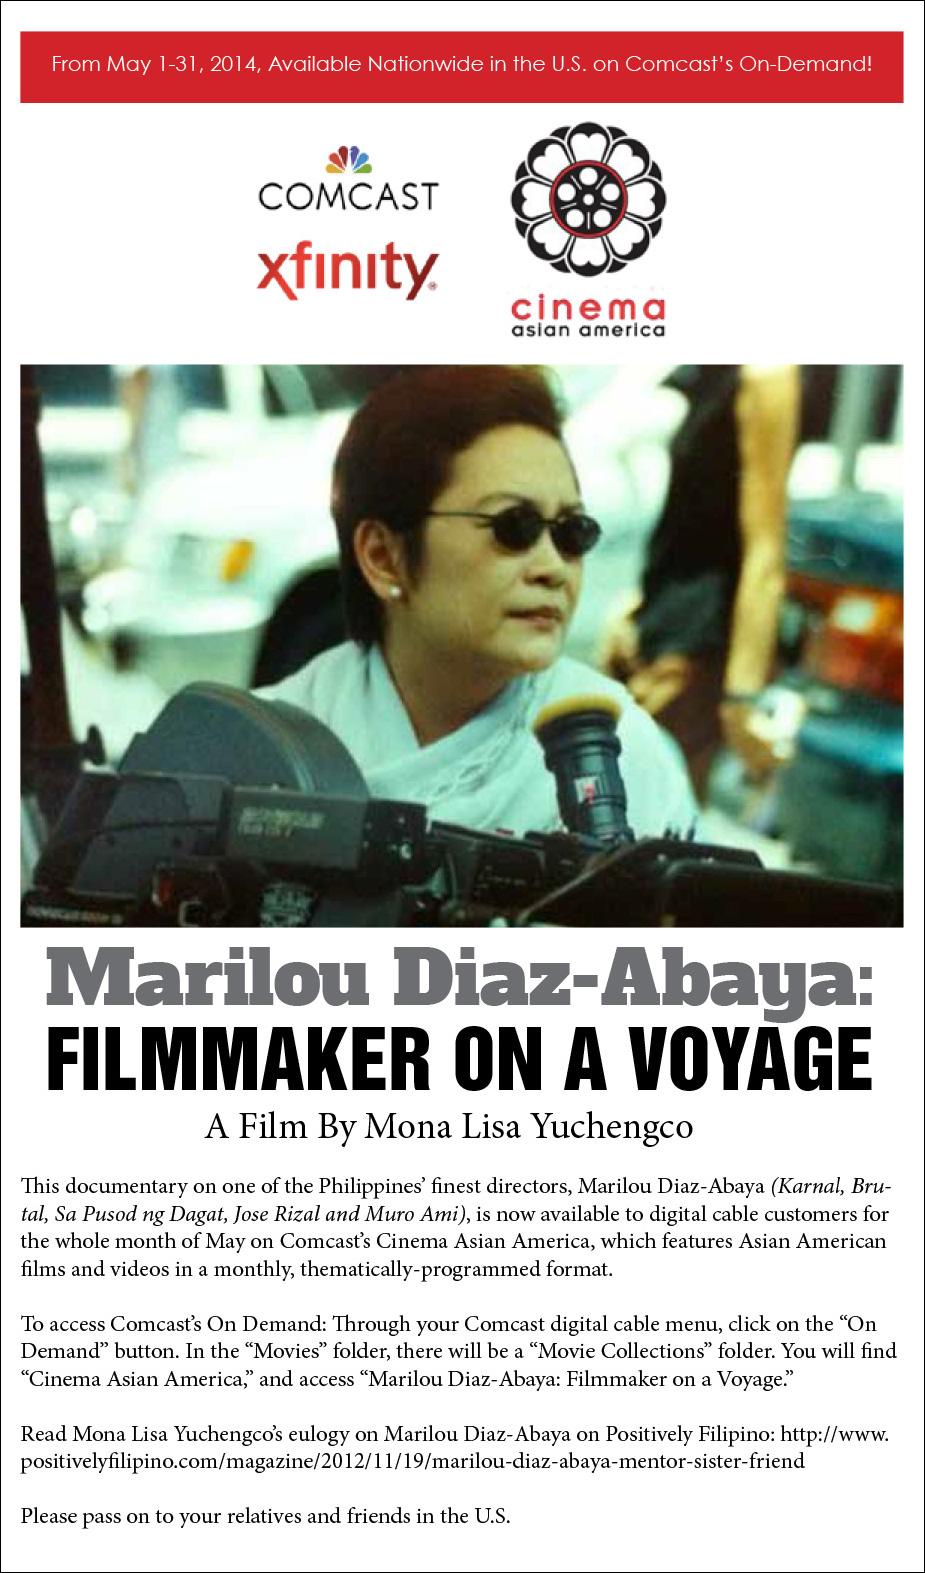 """Marilou Diaz-Abaya: Filmmaker on a Voyage."""